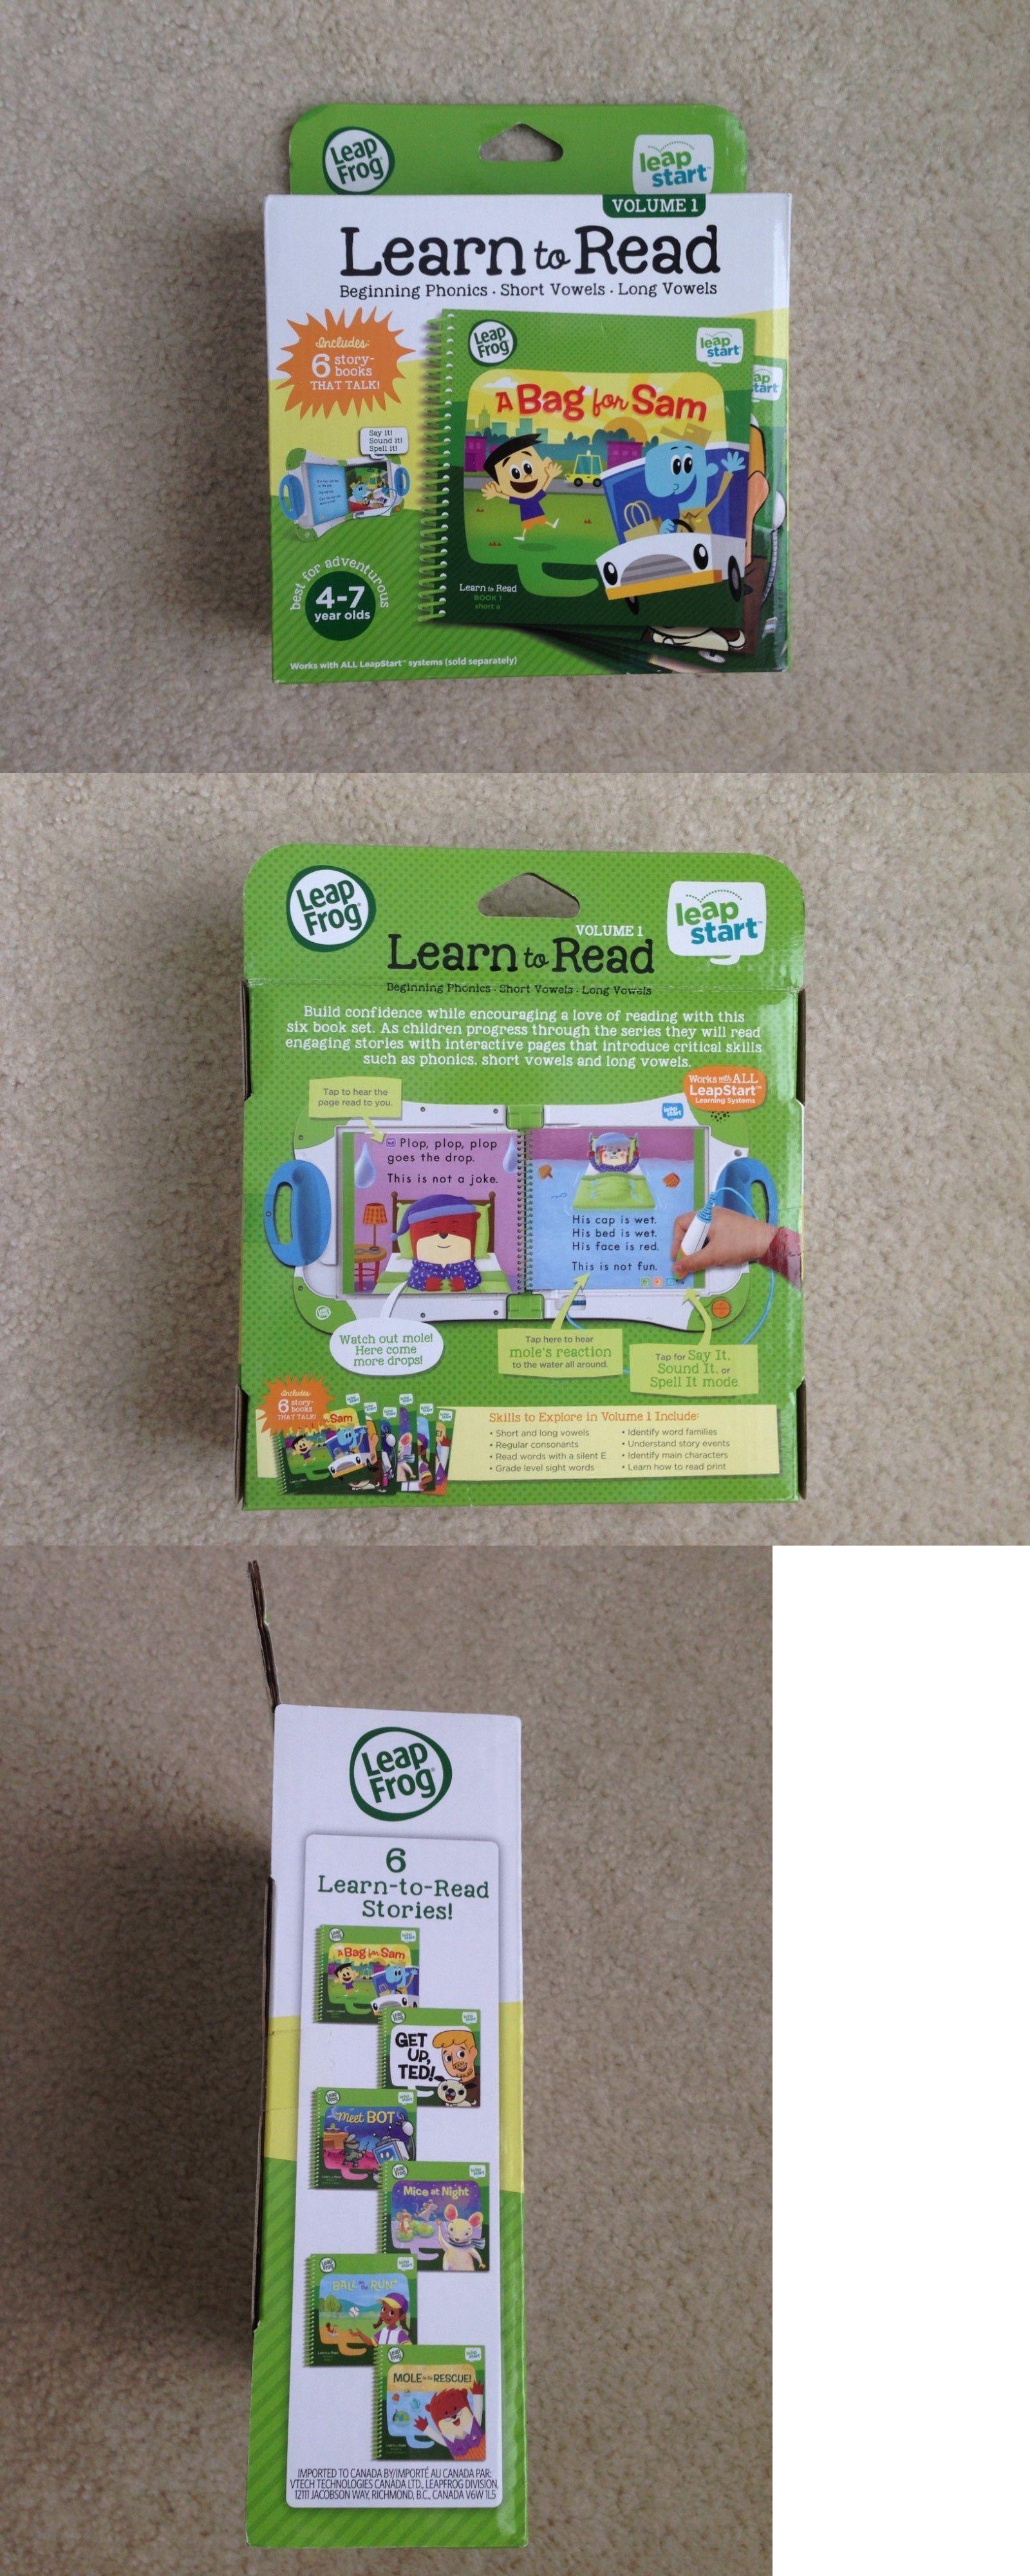 fc7ef1f7e0d1e Electronic Learning Toys 177915  Leapfrog Leapstart Learn To Read Volume 1